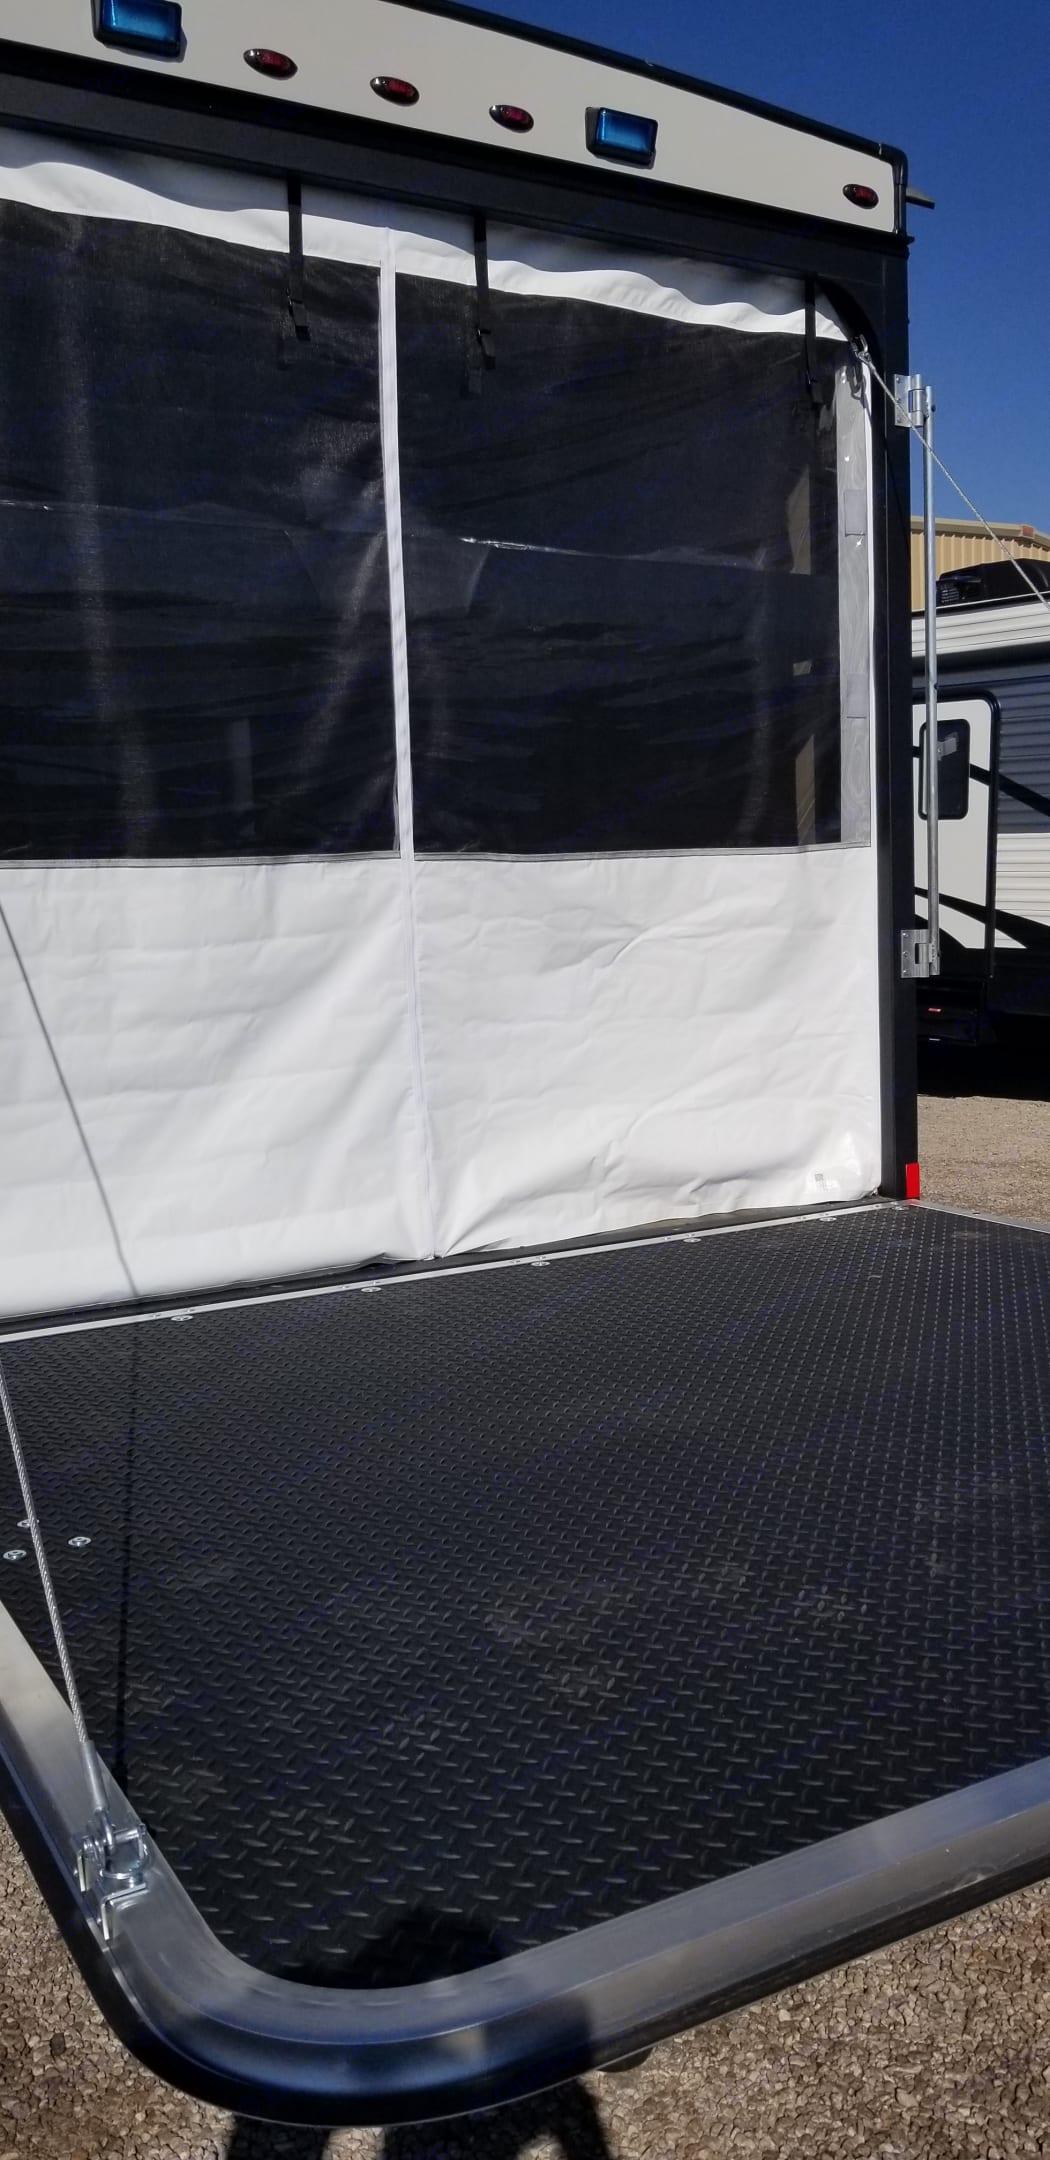 Pacific Coachworks Sandsport 2019